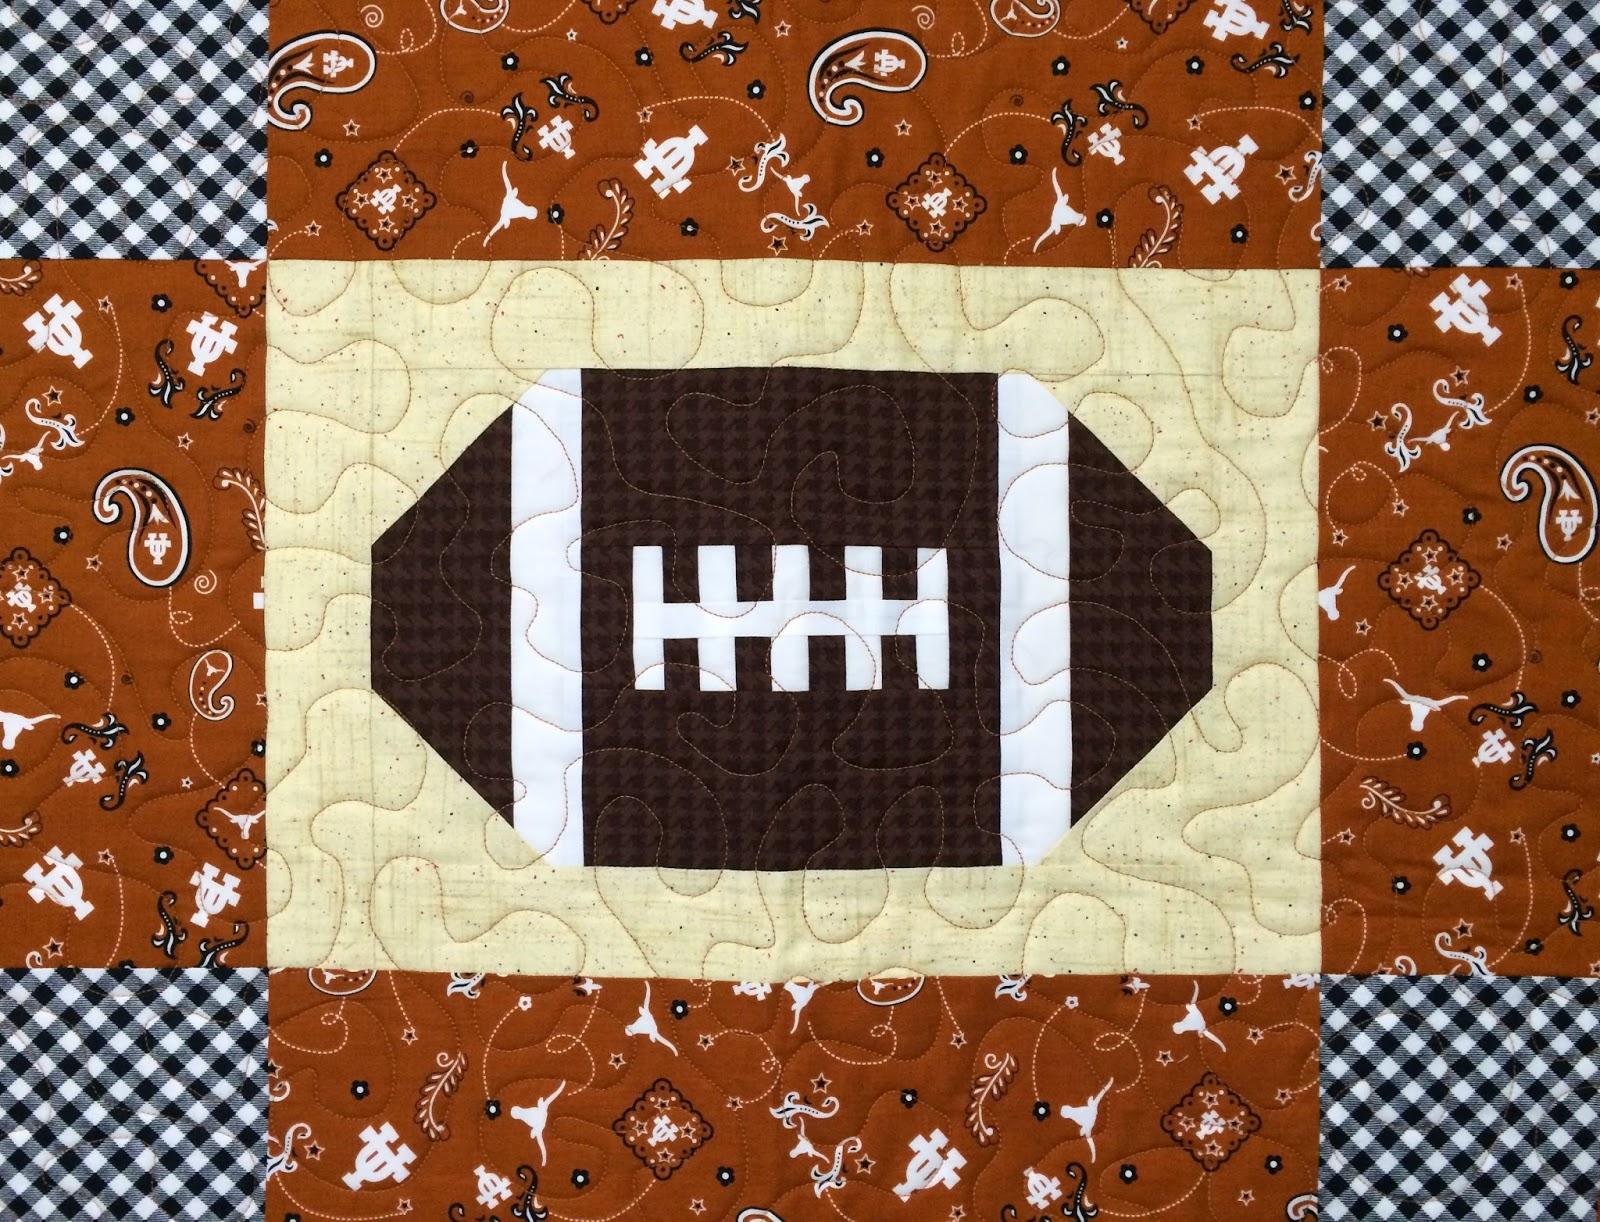 Mette Brown's UT Football Quilt